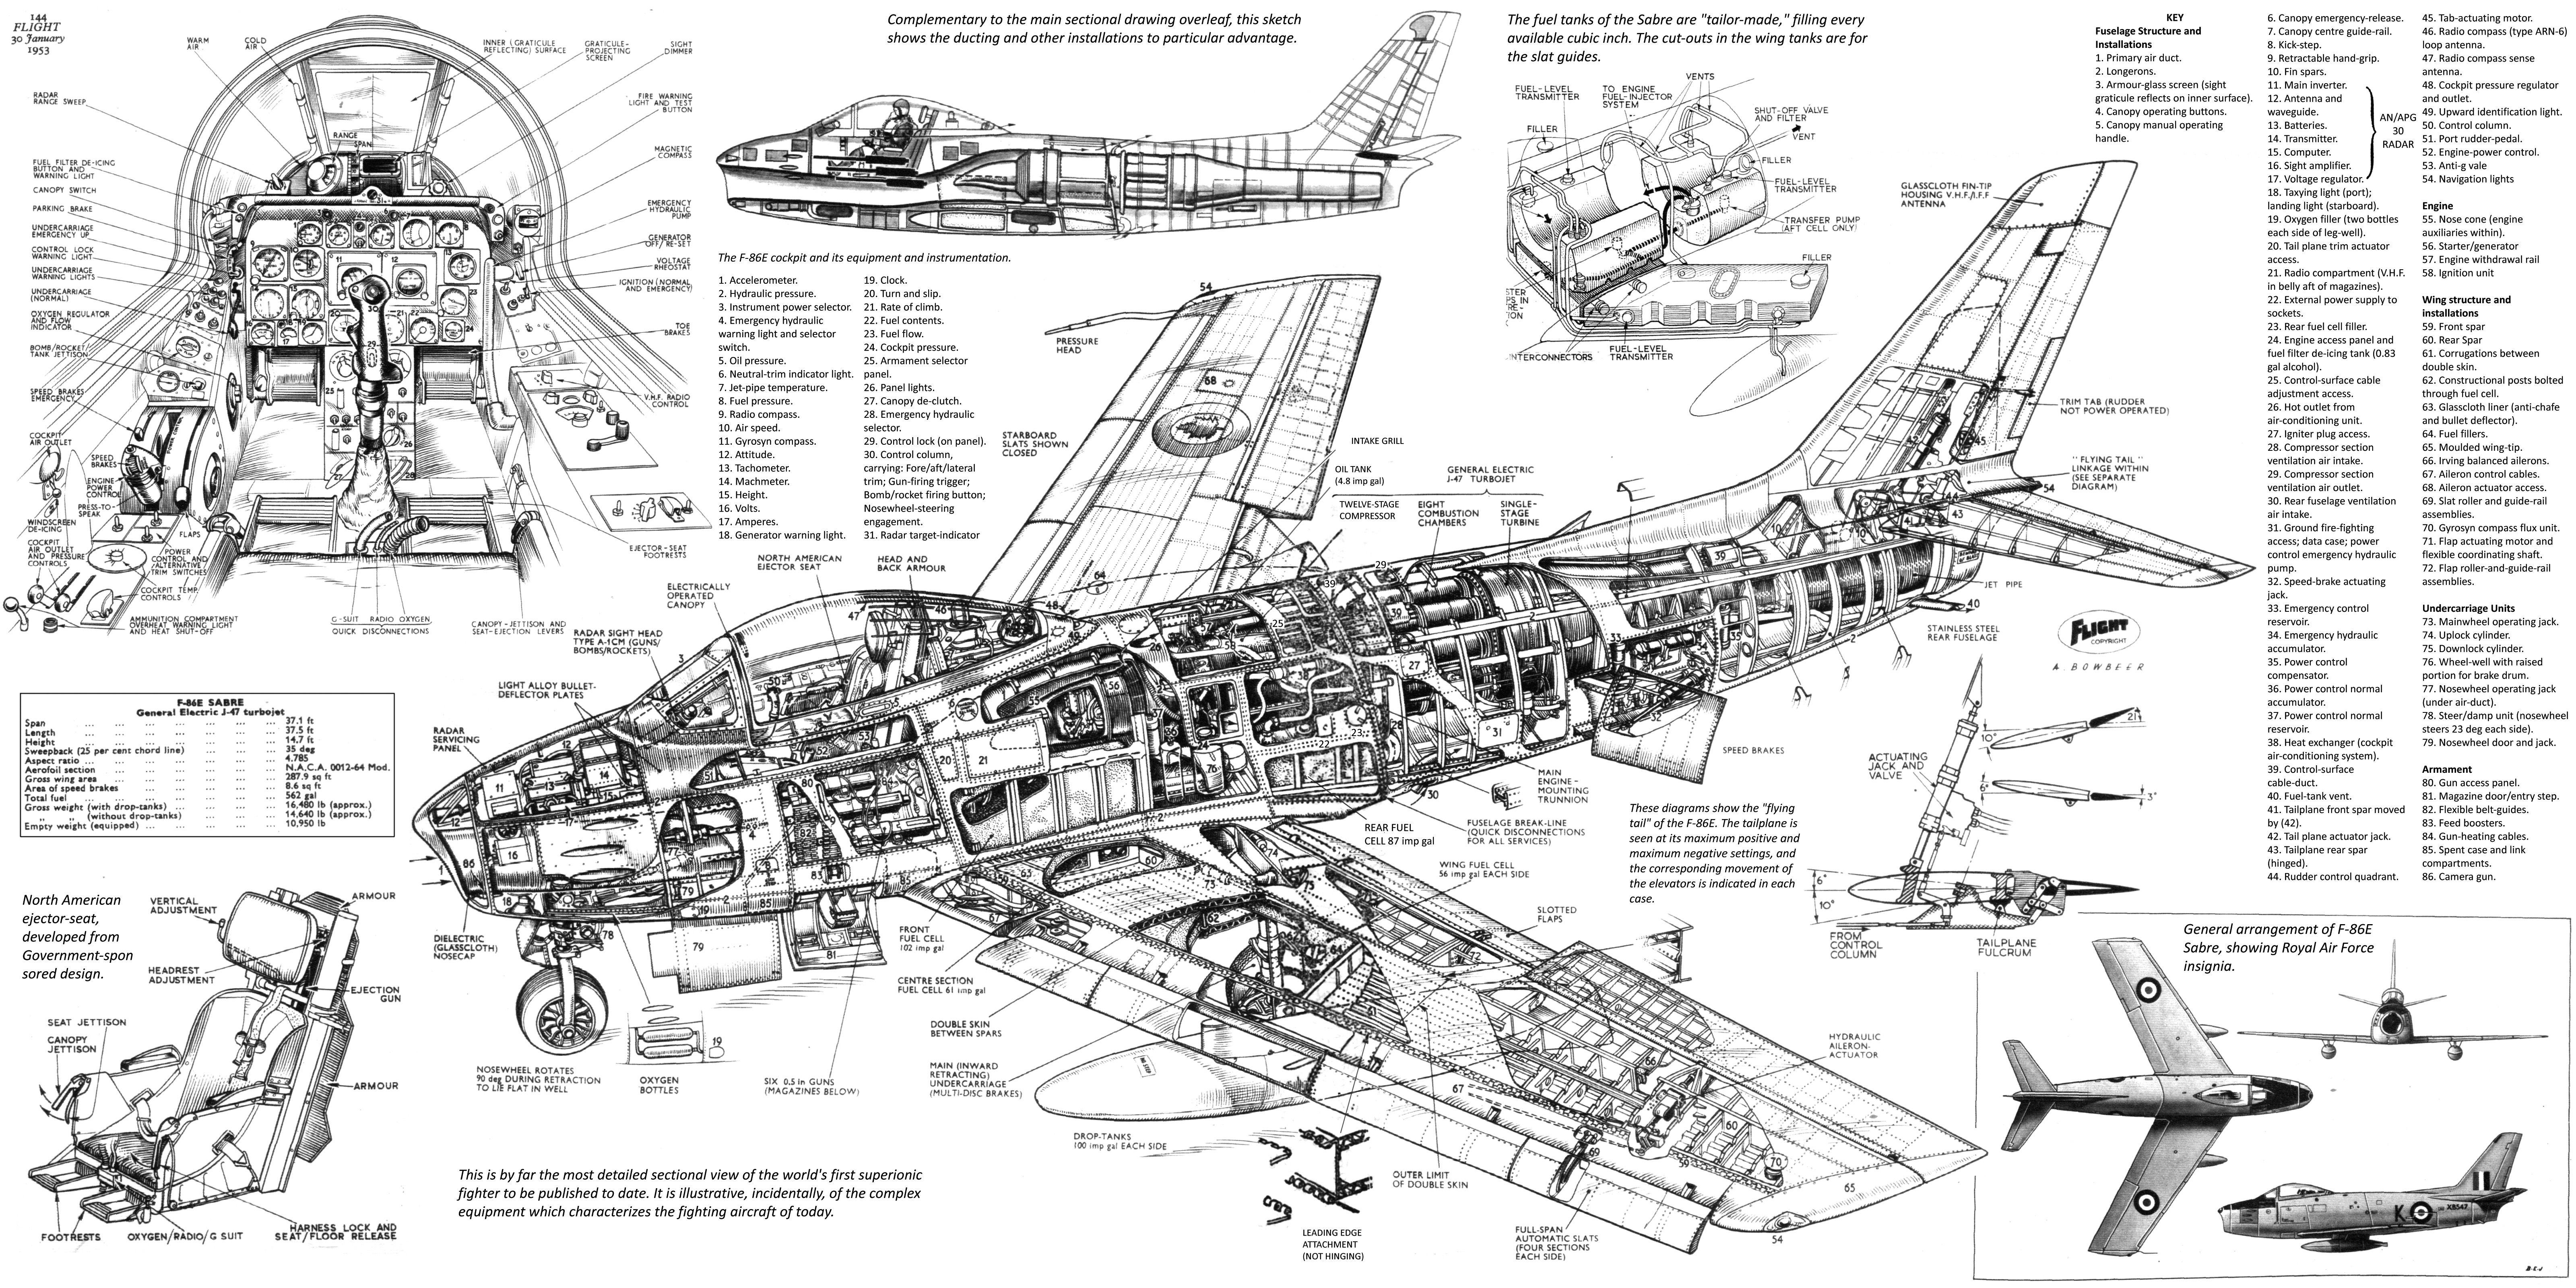 North American F-86 E Sabre cutaway by Arthur Bowbeer | AIRCRAFT -